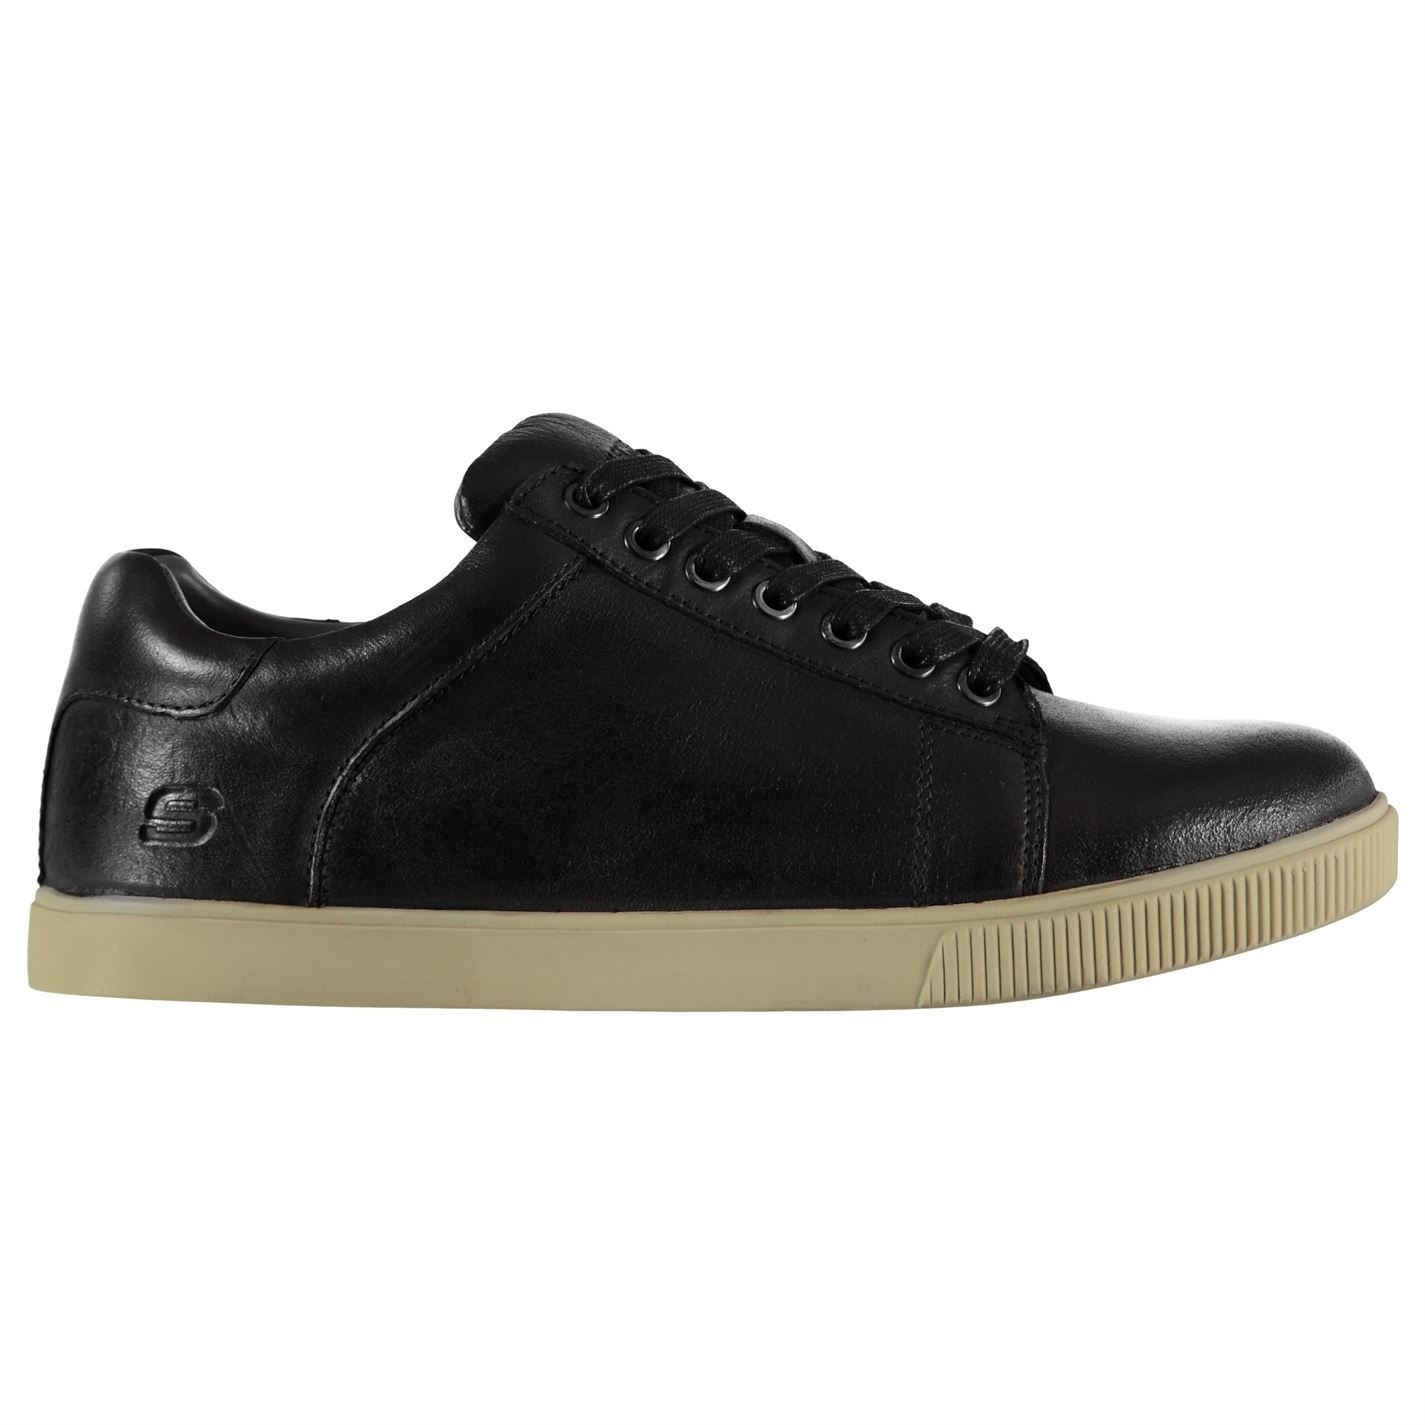 Skechers-Vol-Fandom-Homme-Chaussures-Baskets-decontractees-chaussures-baskets miniature 6